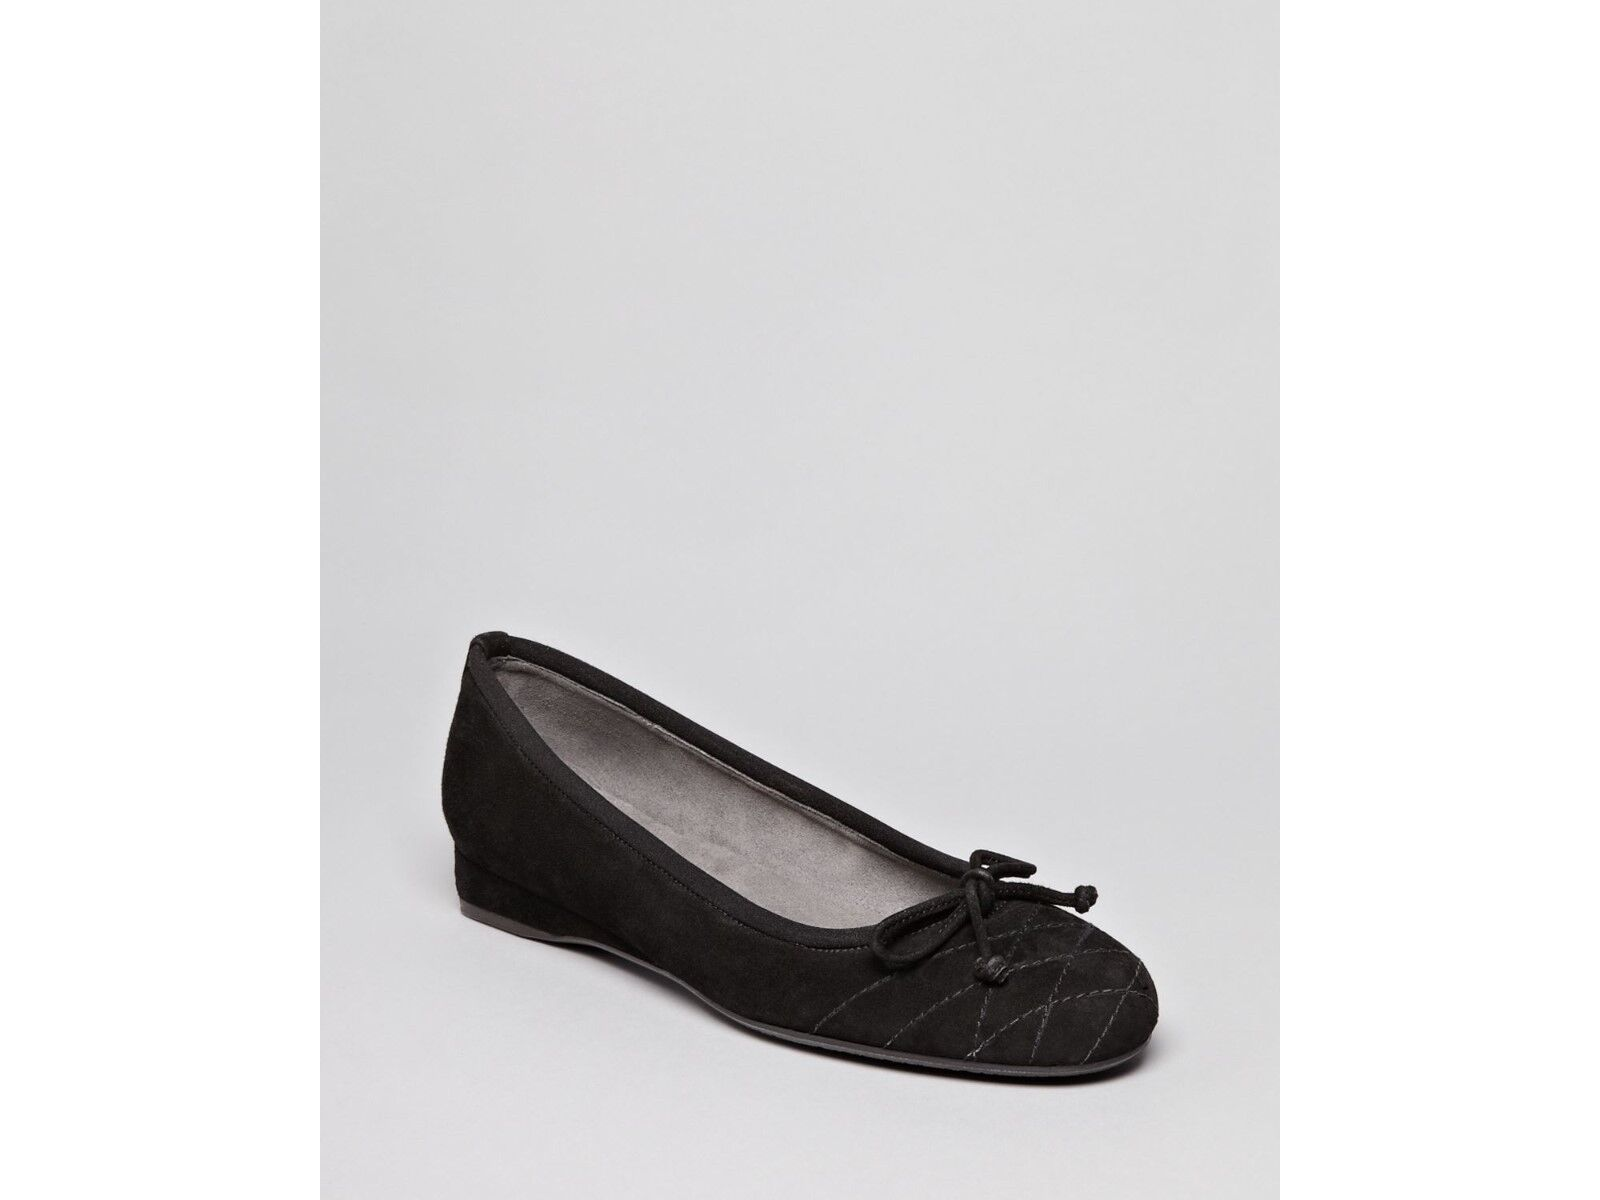 Stuart Weitzman Women's Ballet Flats Shoes Demiwedge Black 5.5M